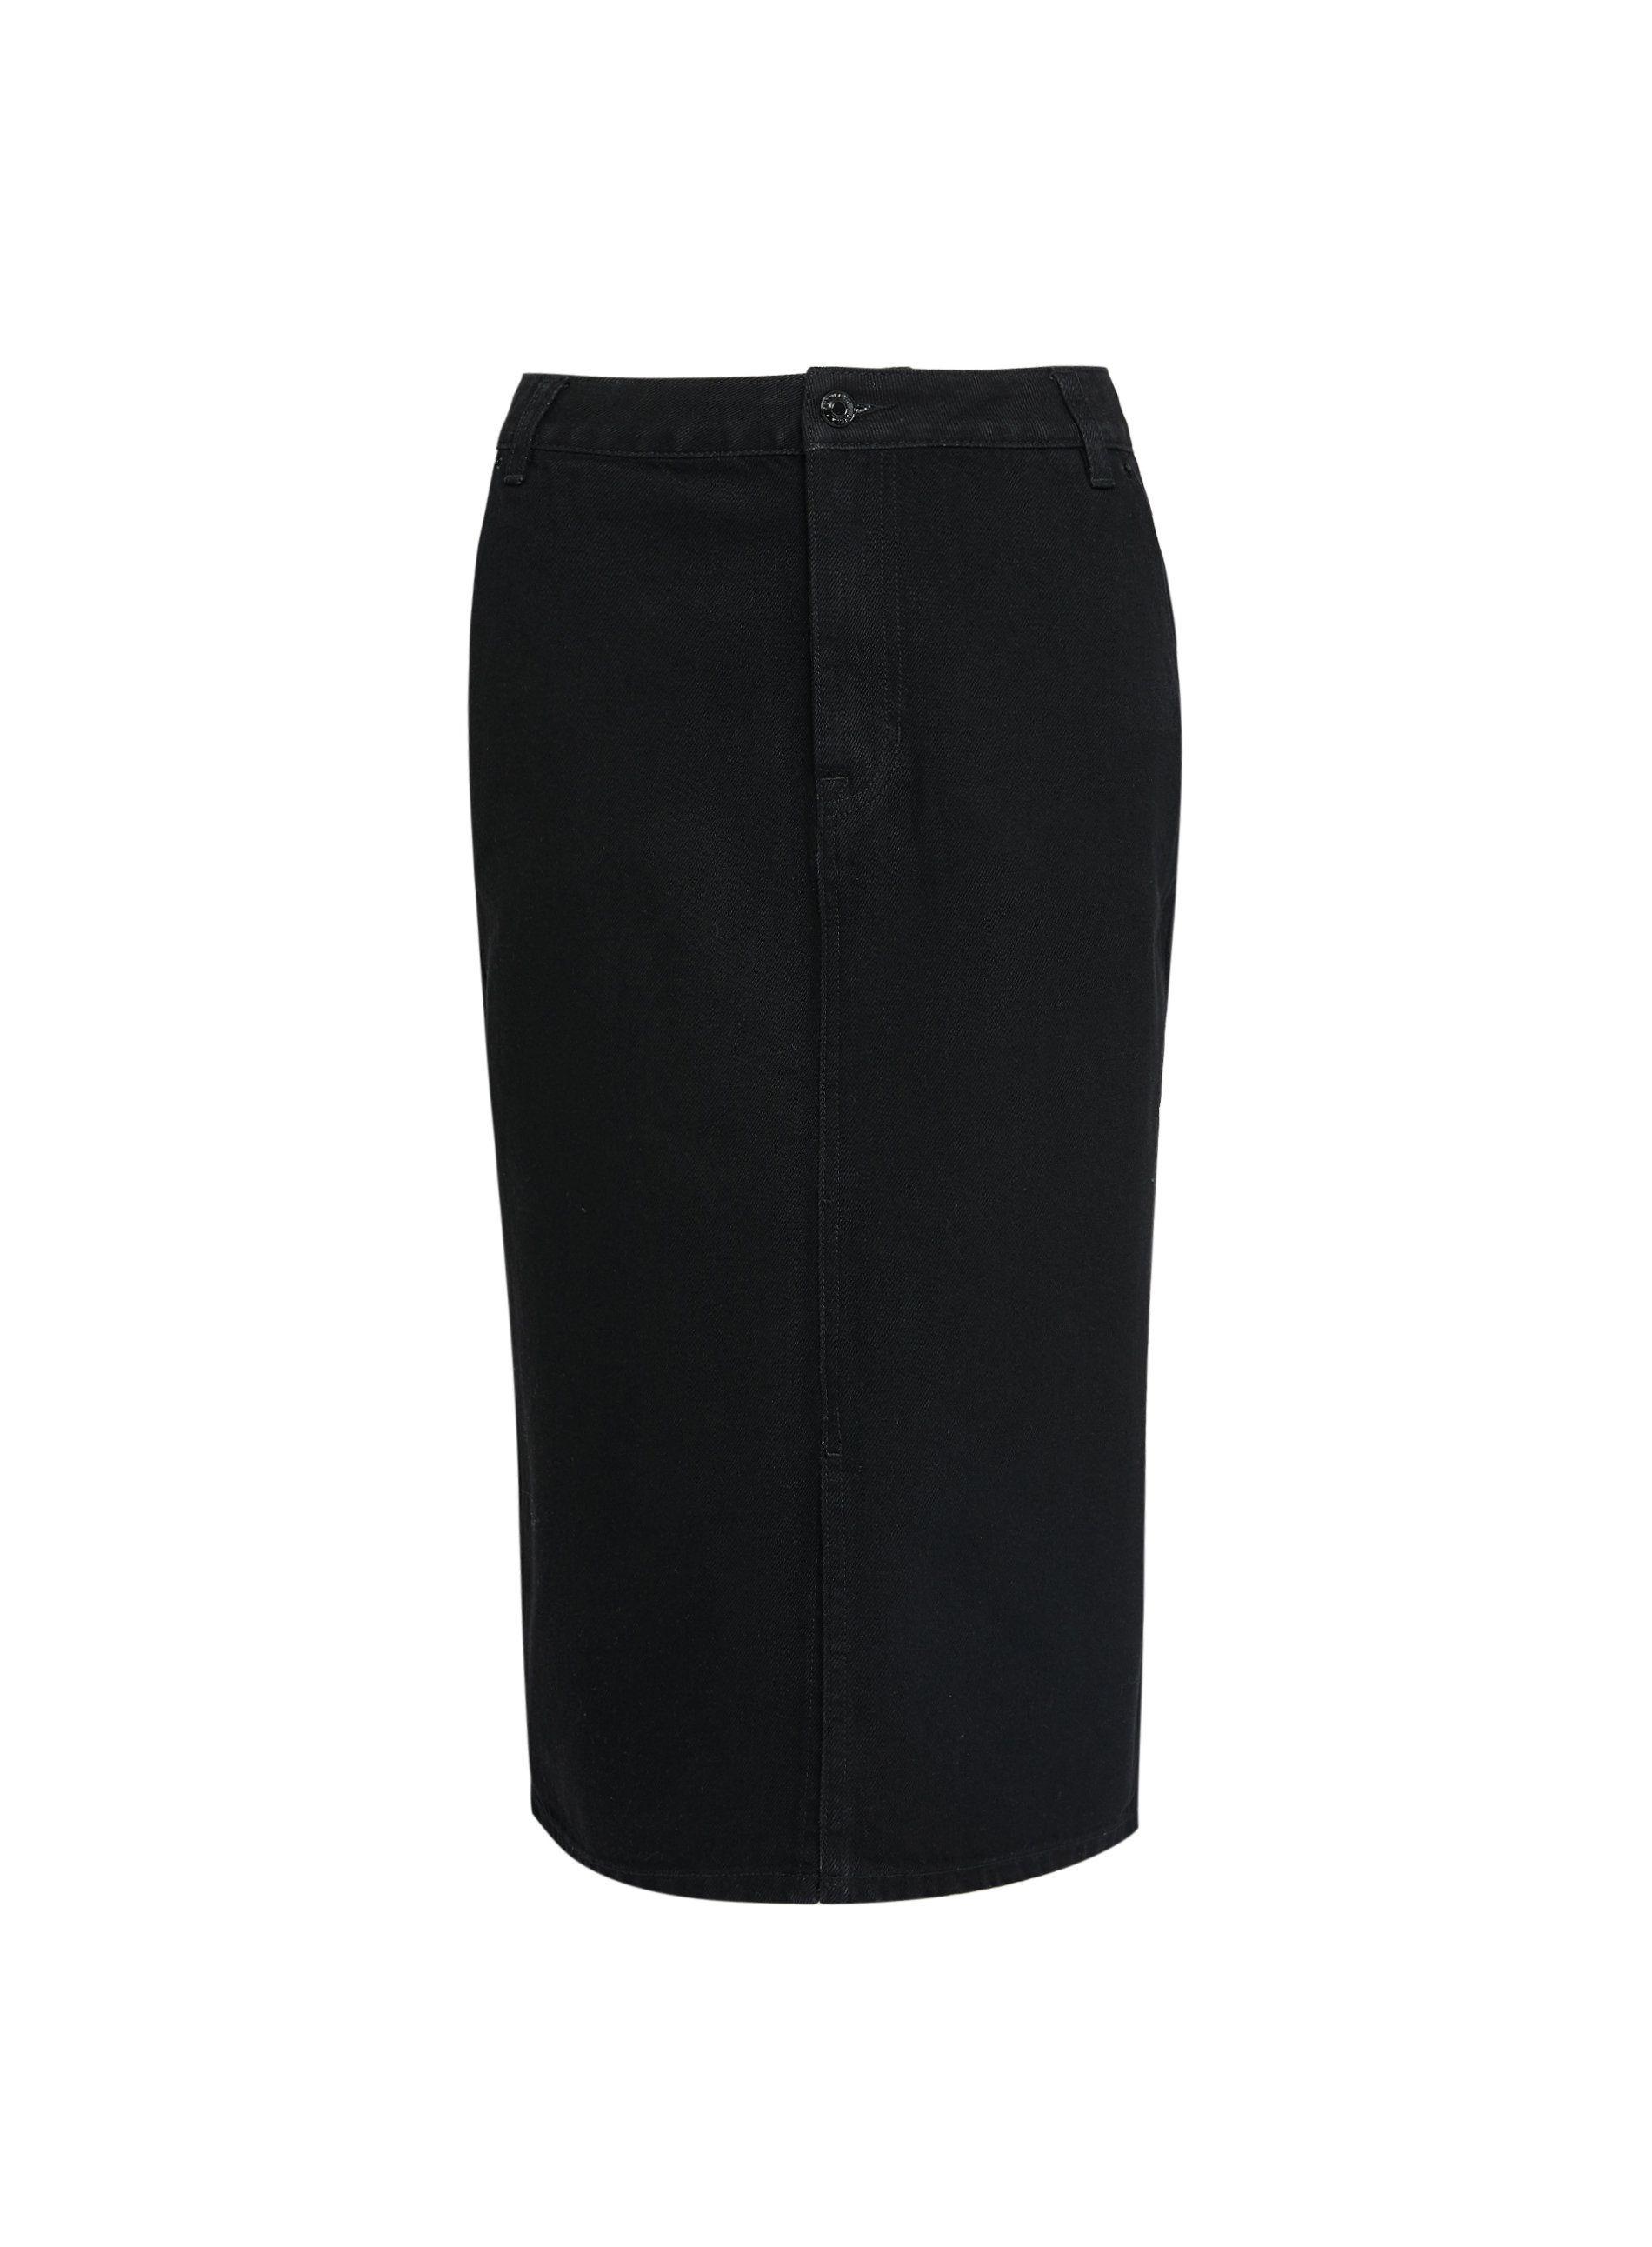 Dorothy Perkins Womens Tall Black Denim Midi Pencil Skirt Front Button Bottoms